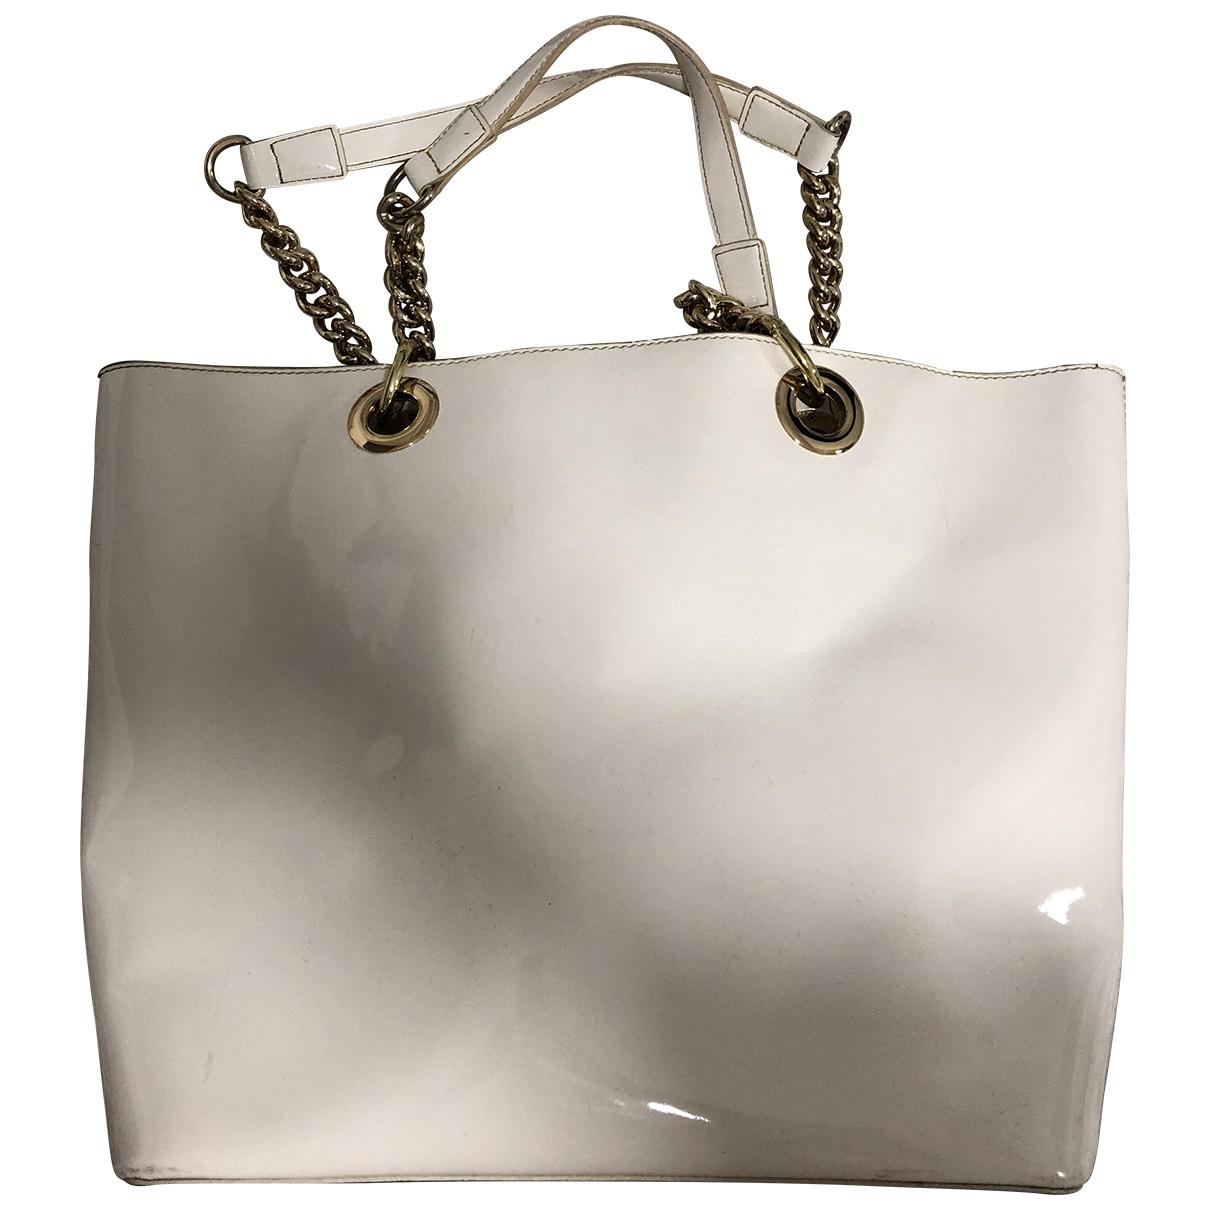 Dkny \N Patent leather handbag for Women \N